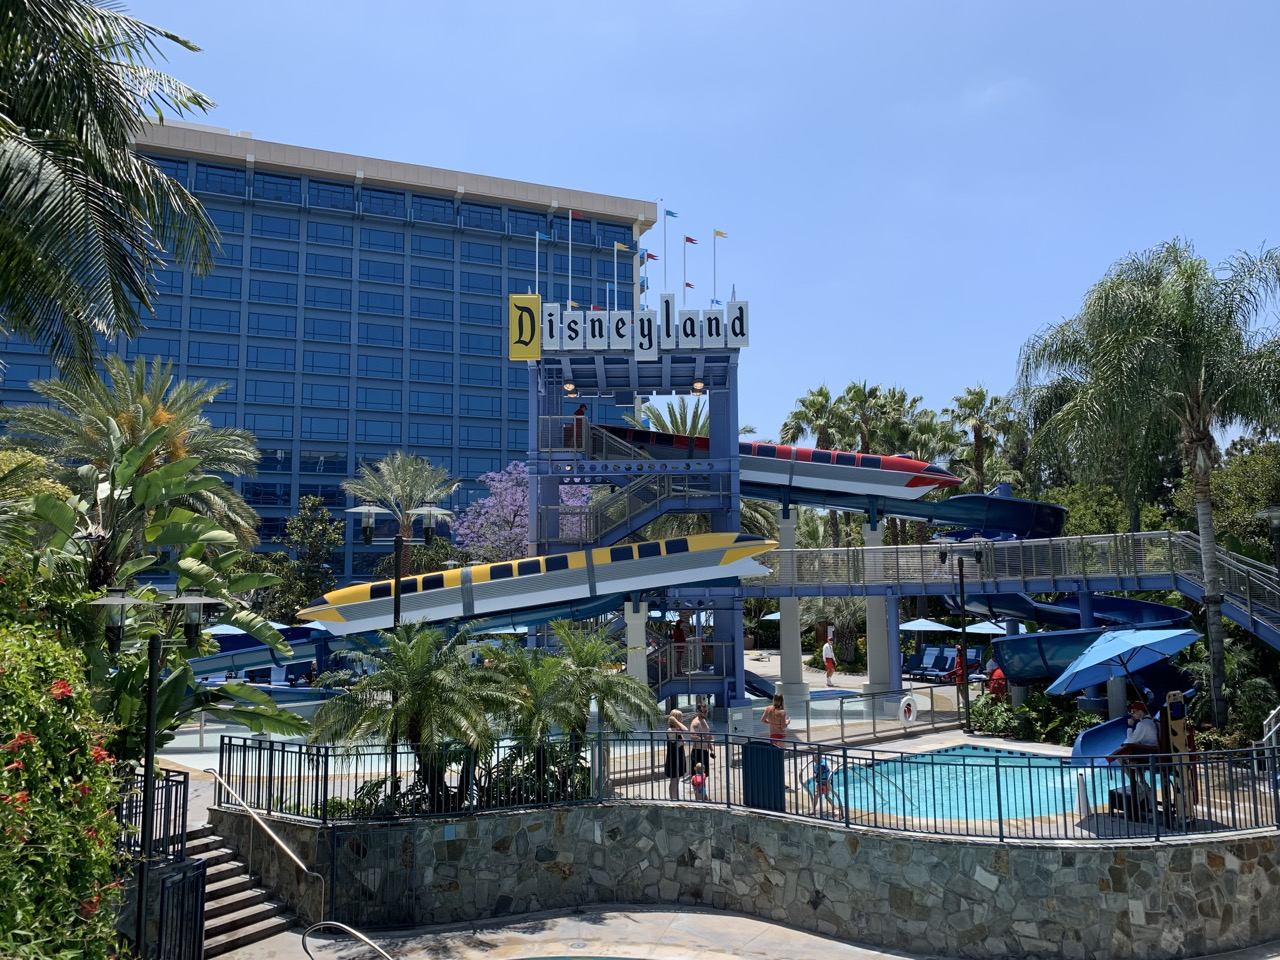 disneyland trip report day 1 disneyland hotel pool 1.jpeg